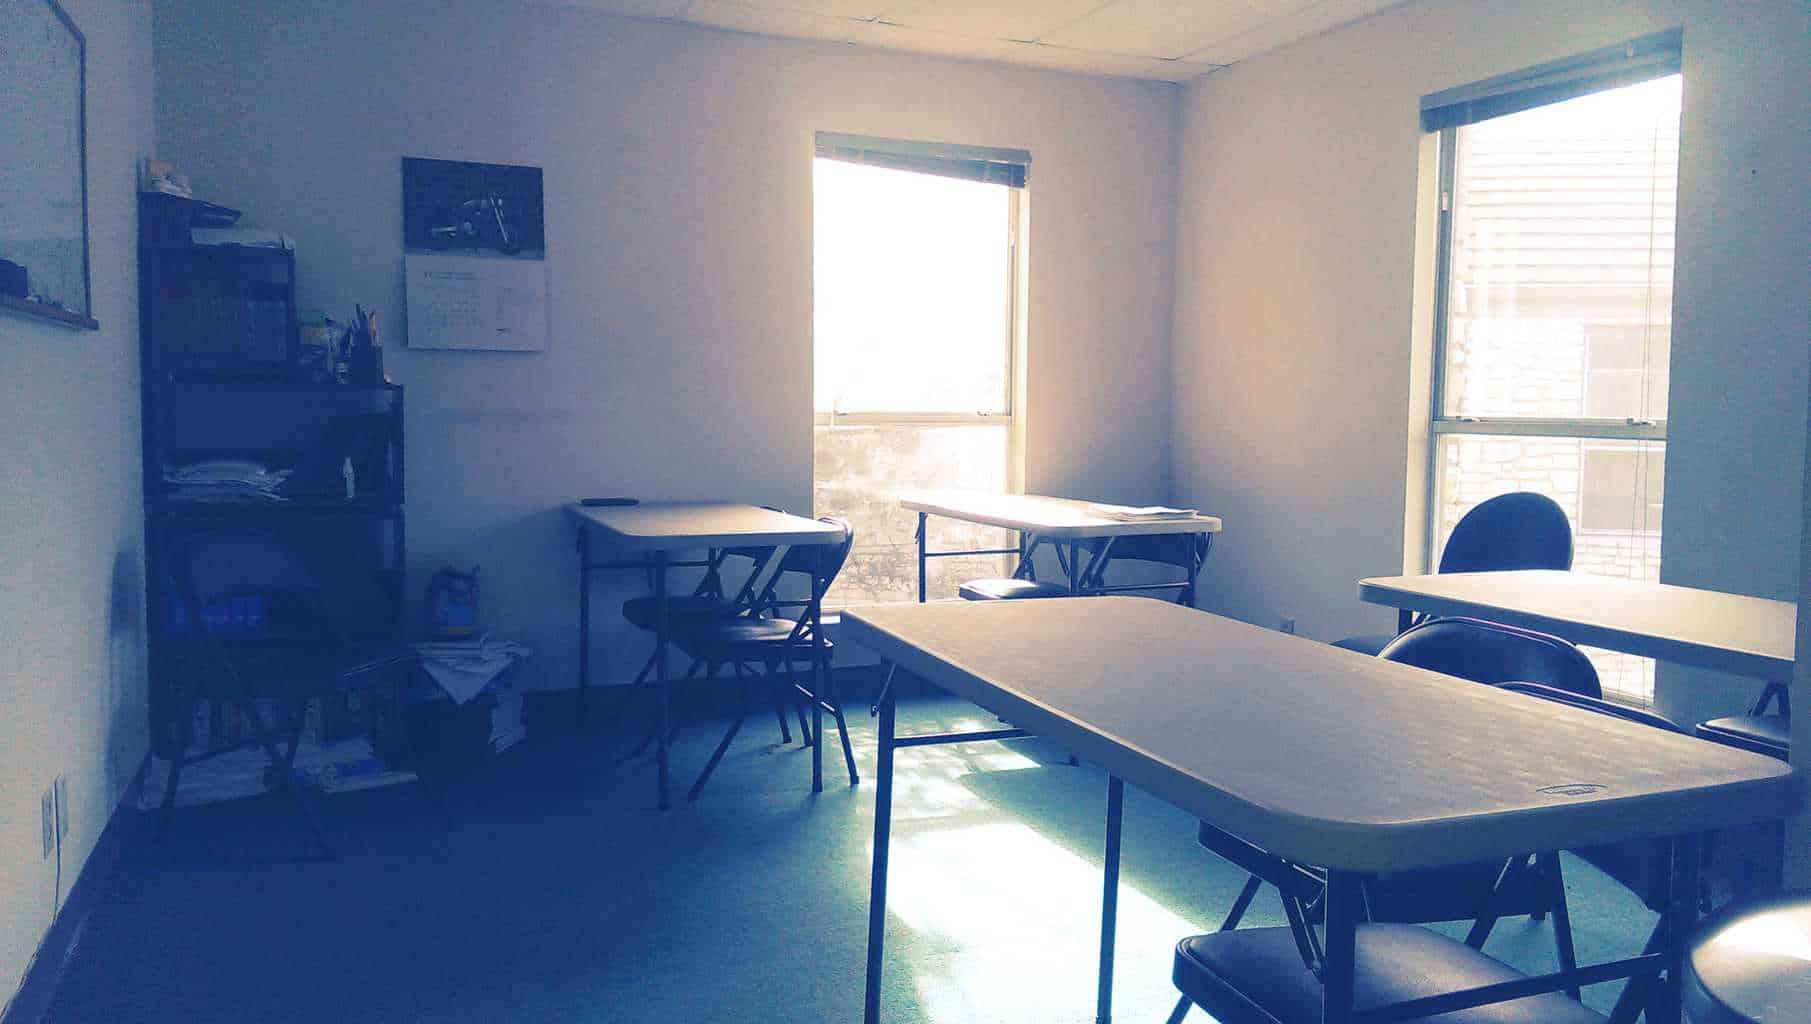 Test Prep Office in Austin